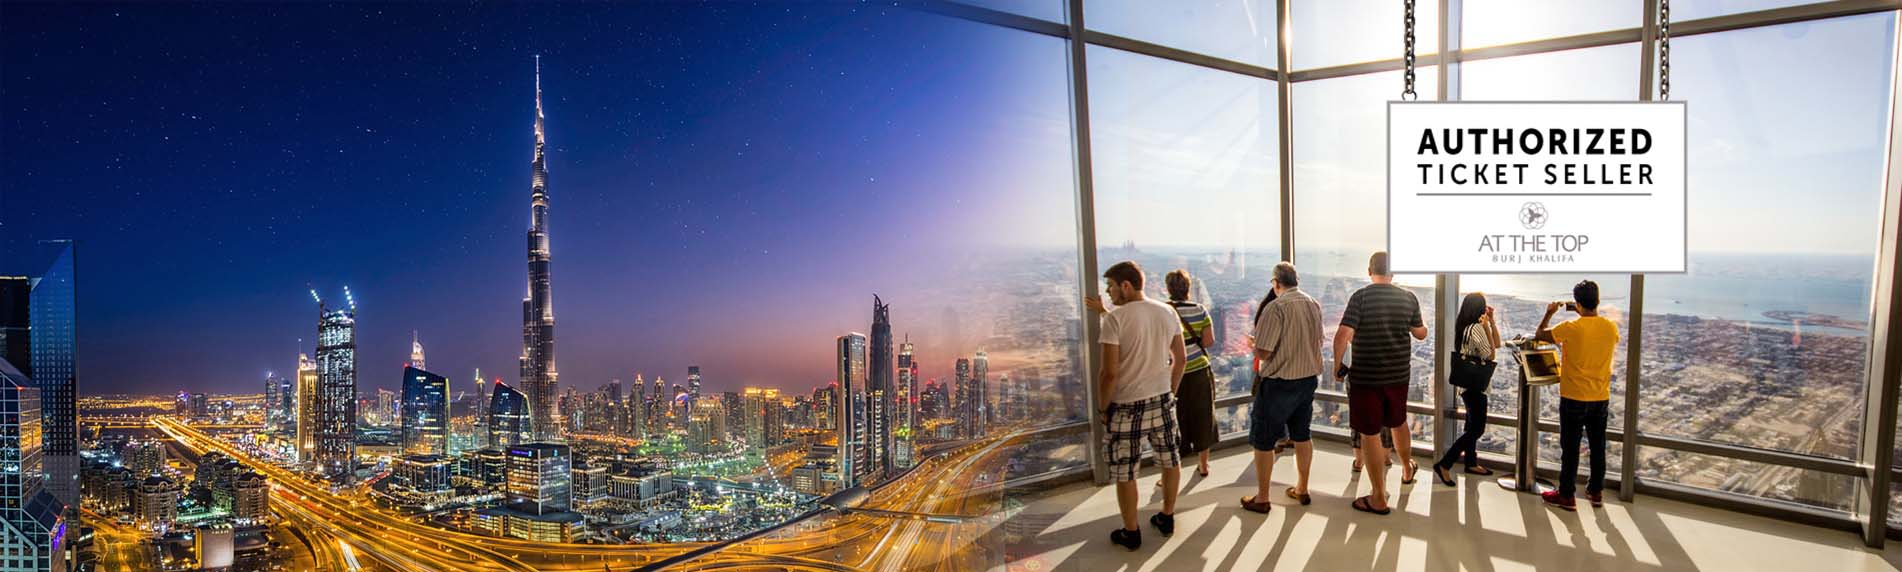 burj khalifa dubai tickets